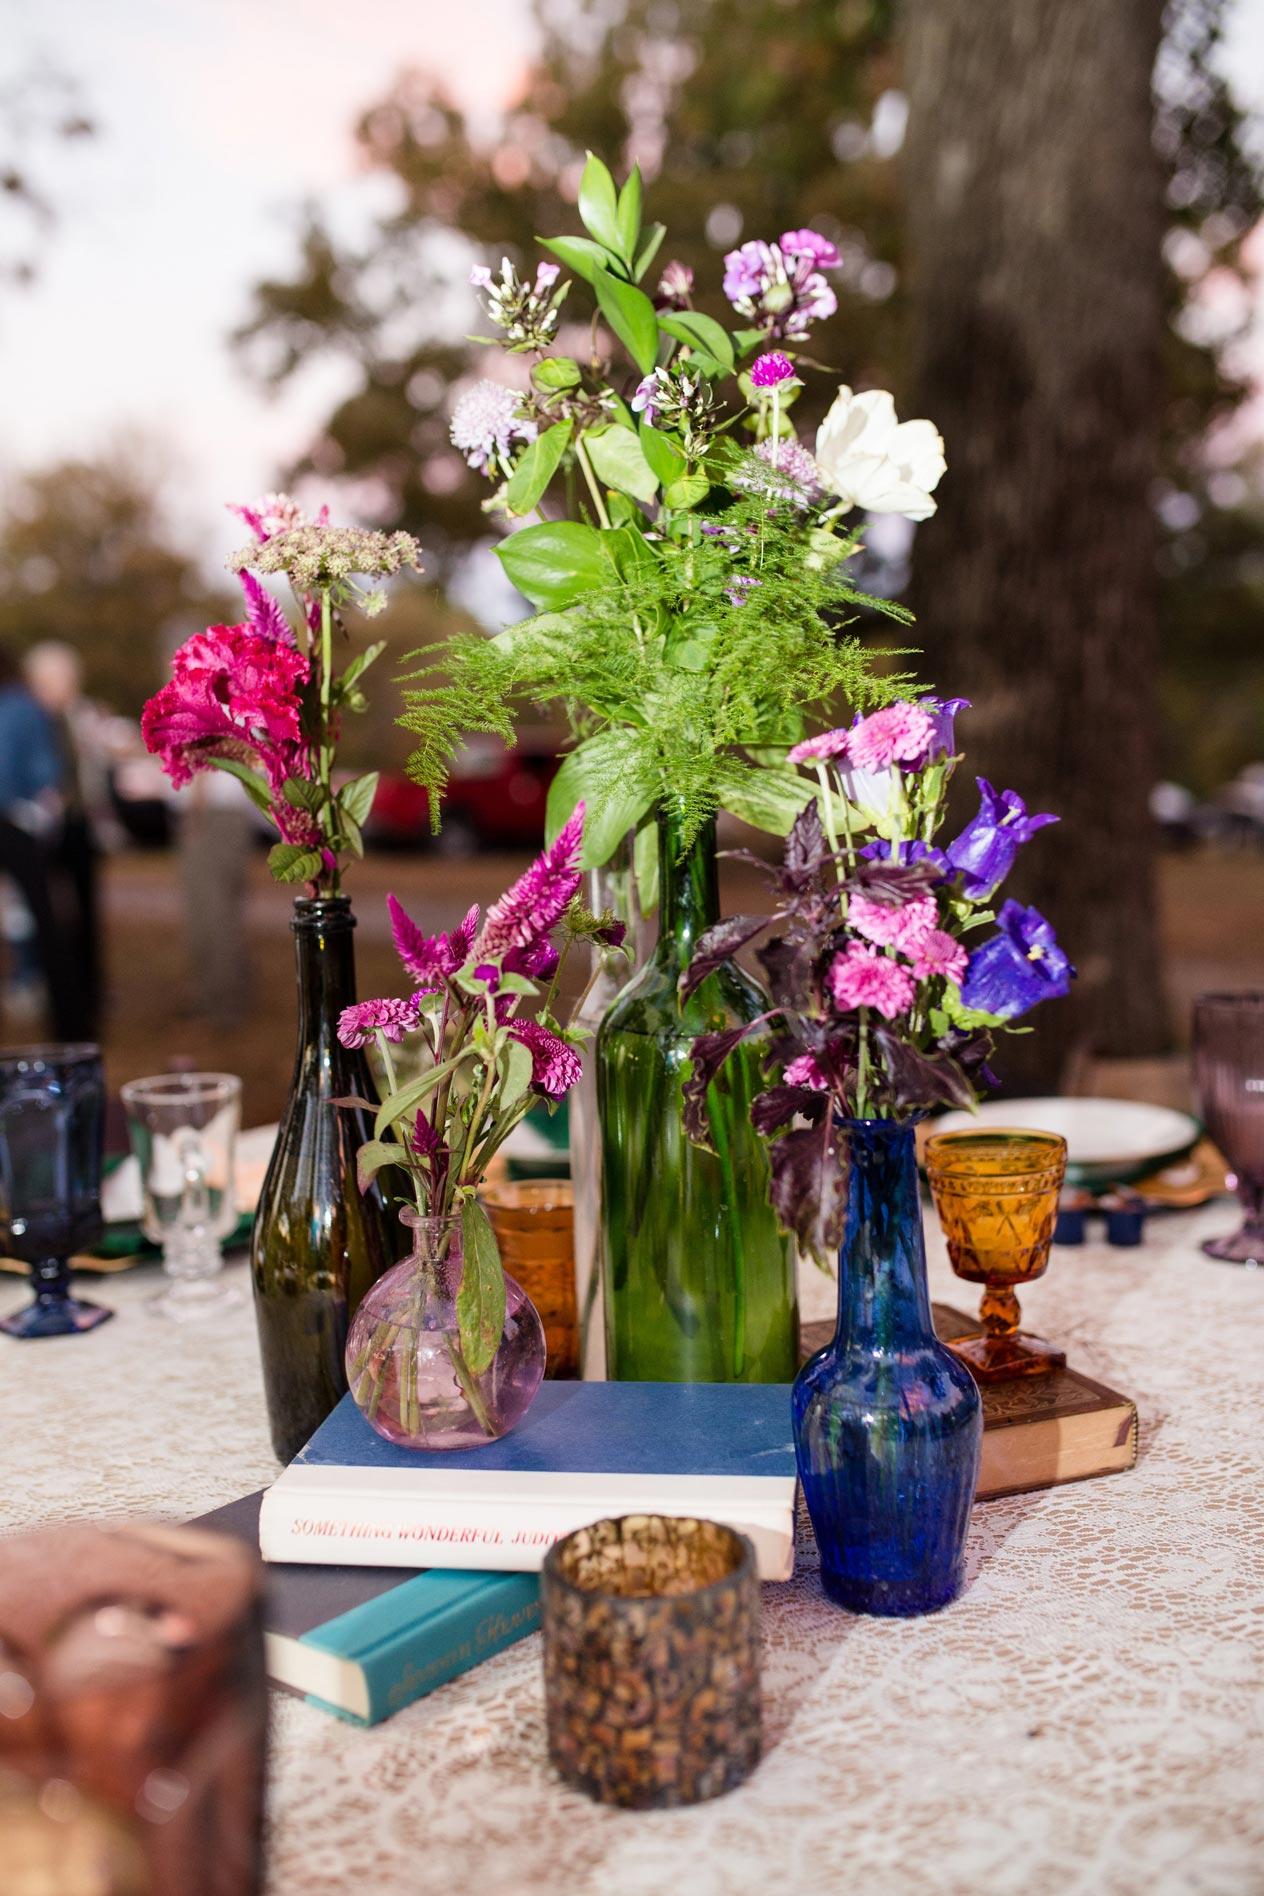 Rustic-Whimsical-Wedding- Tulsa-Wedding-FloristRobyns-Flower-Garden_Mallory-Hall-Photography10.jpg